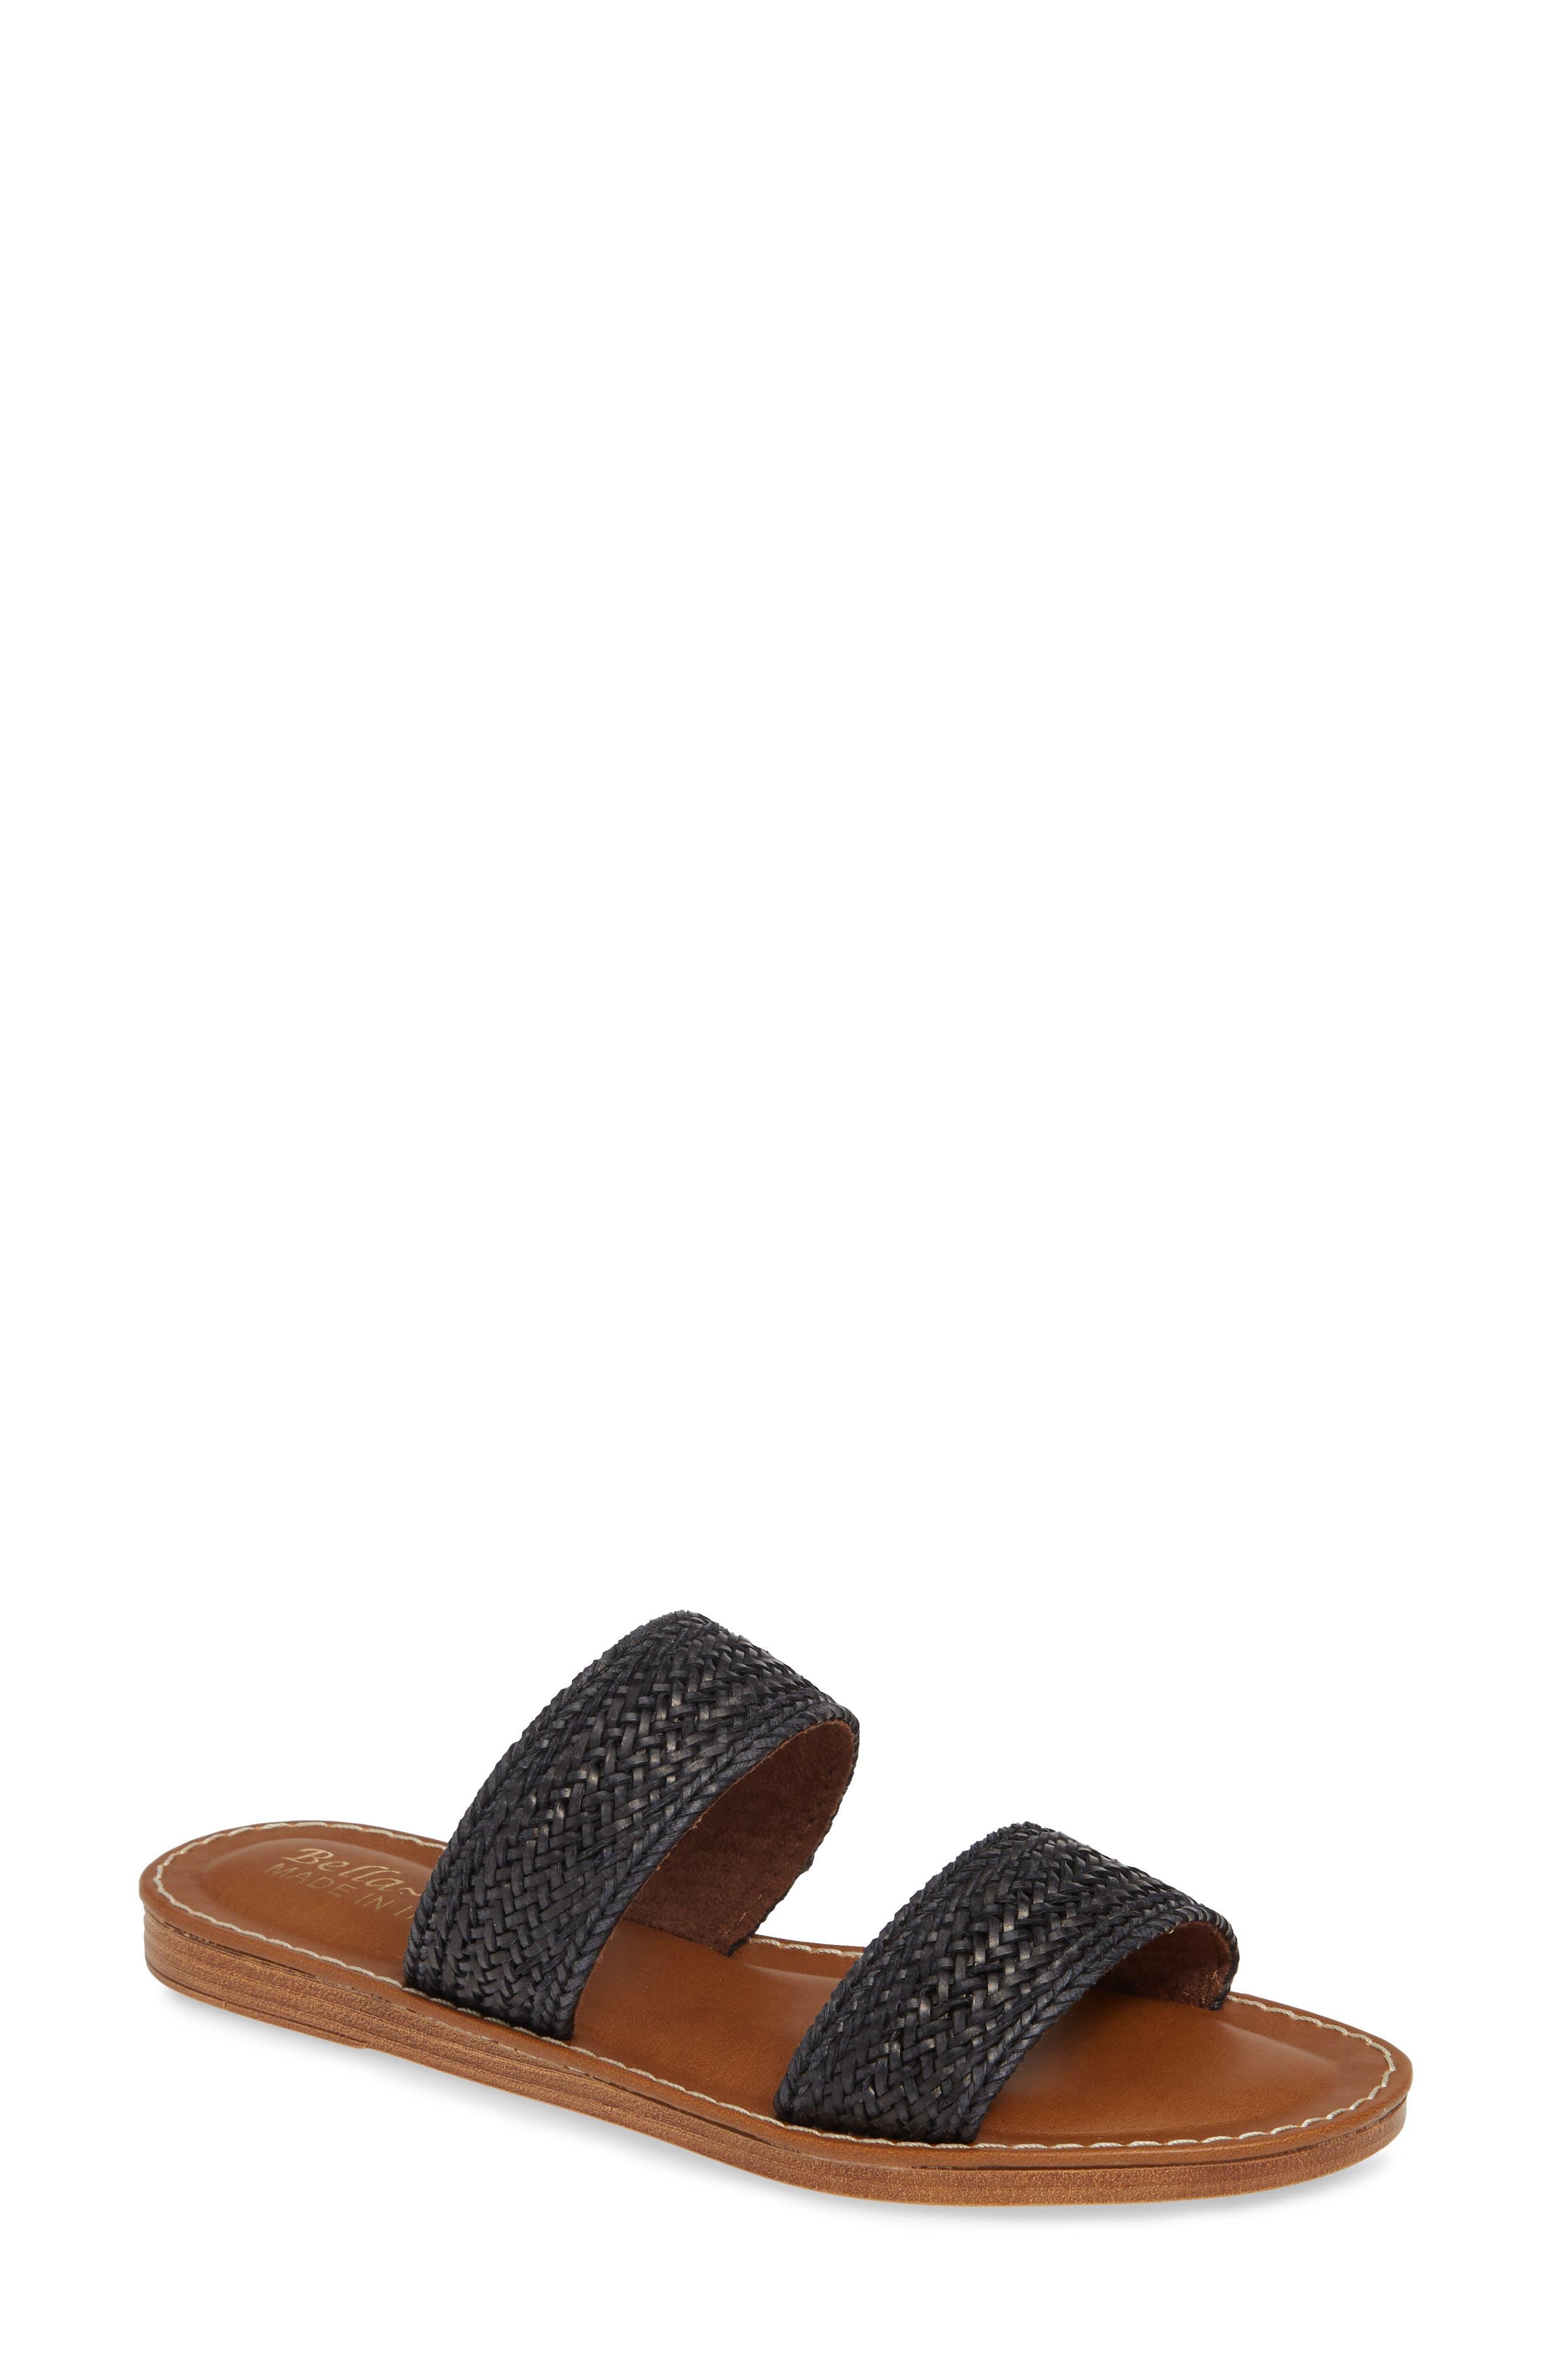 BELLA VITA Two-Strap Slide Sandal, Main, color, BLACK WOVEN